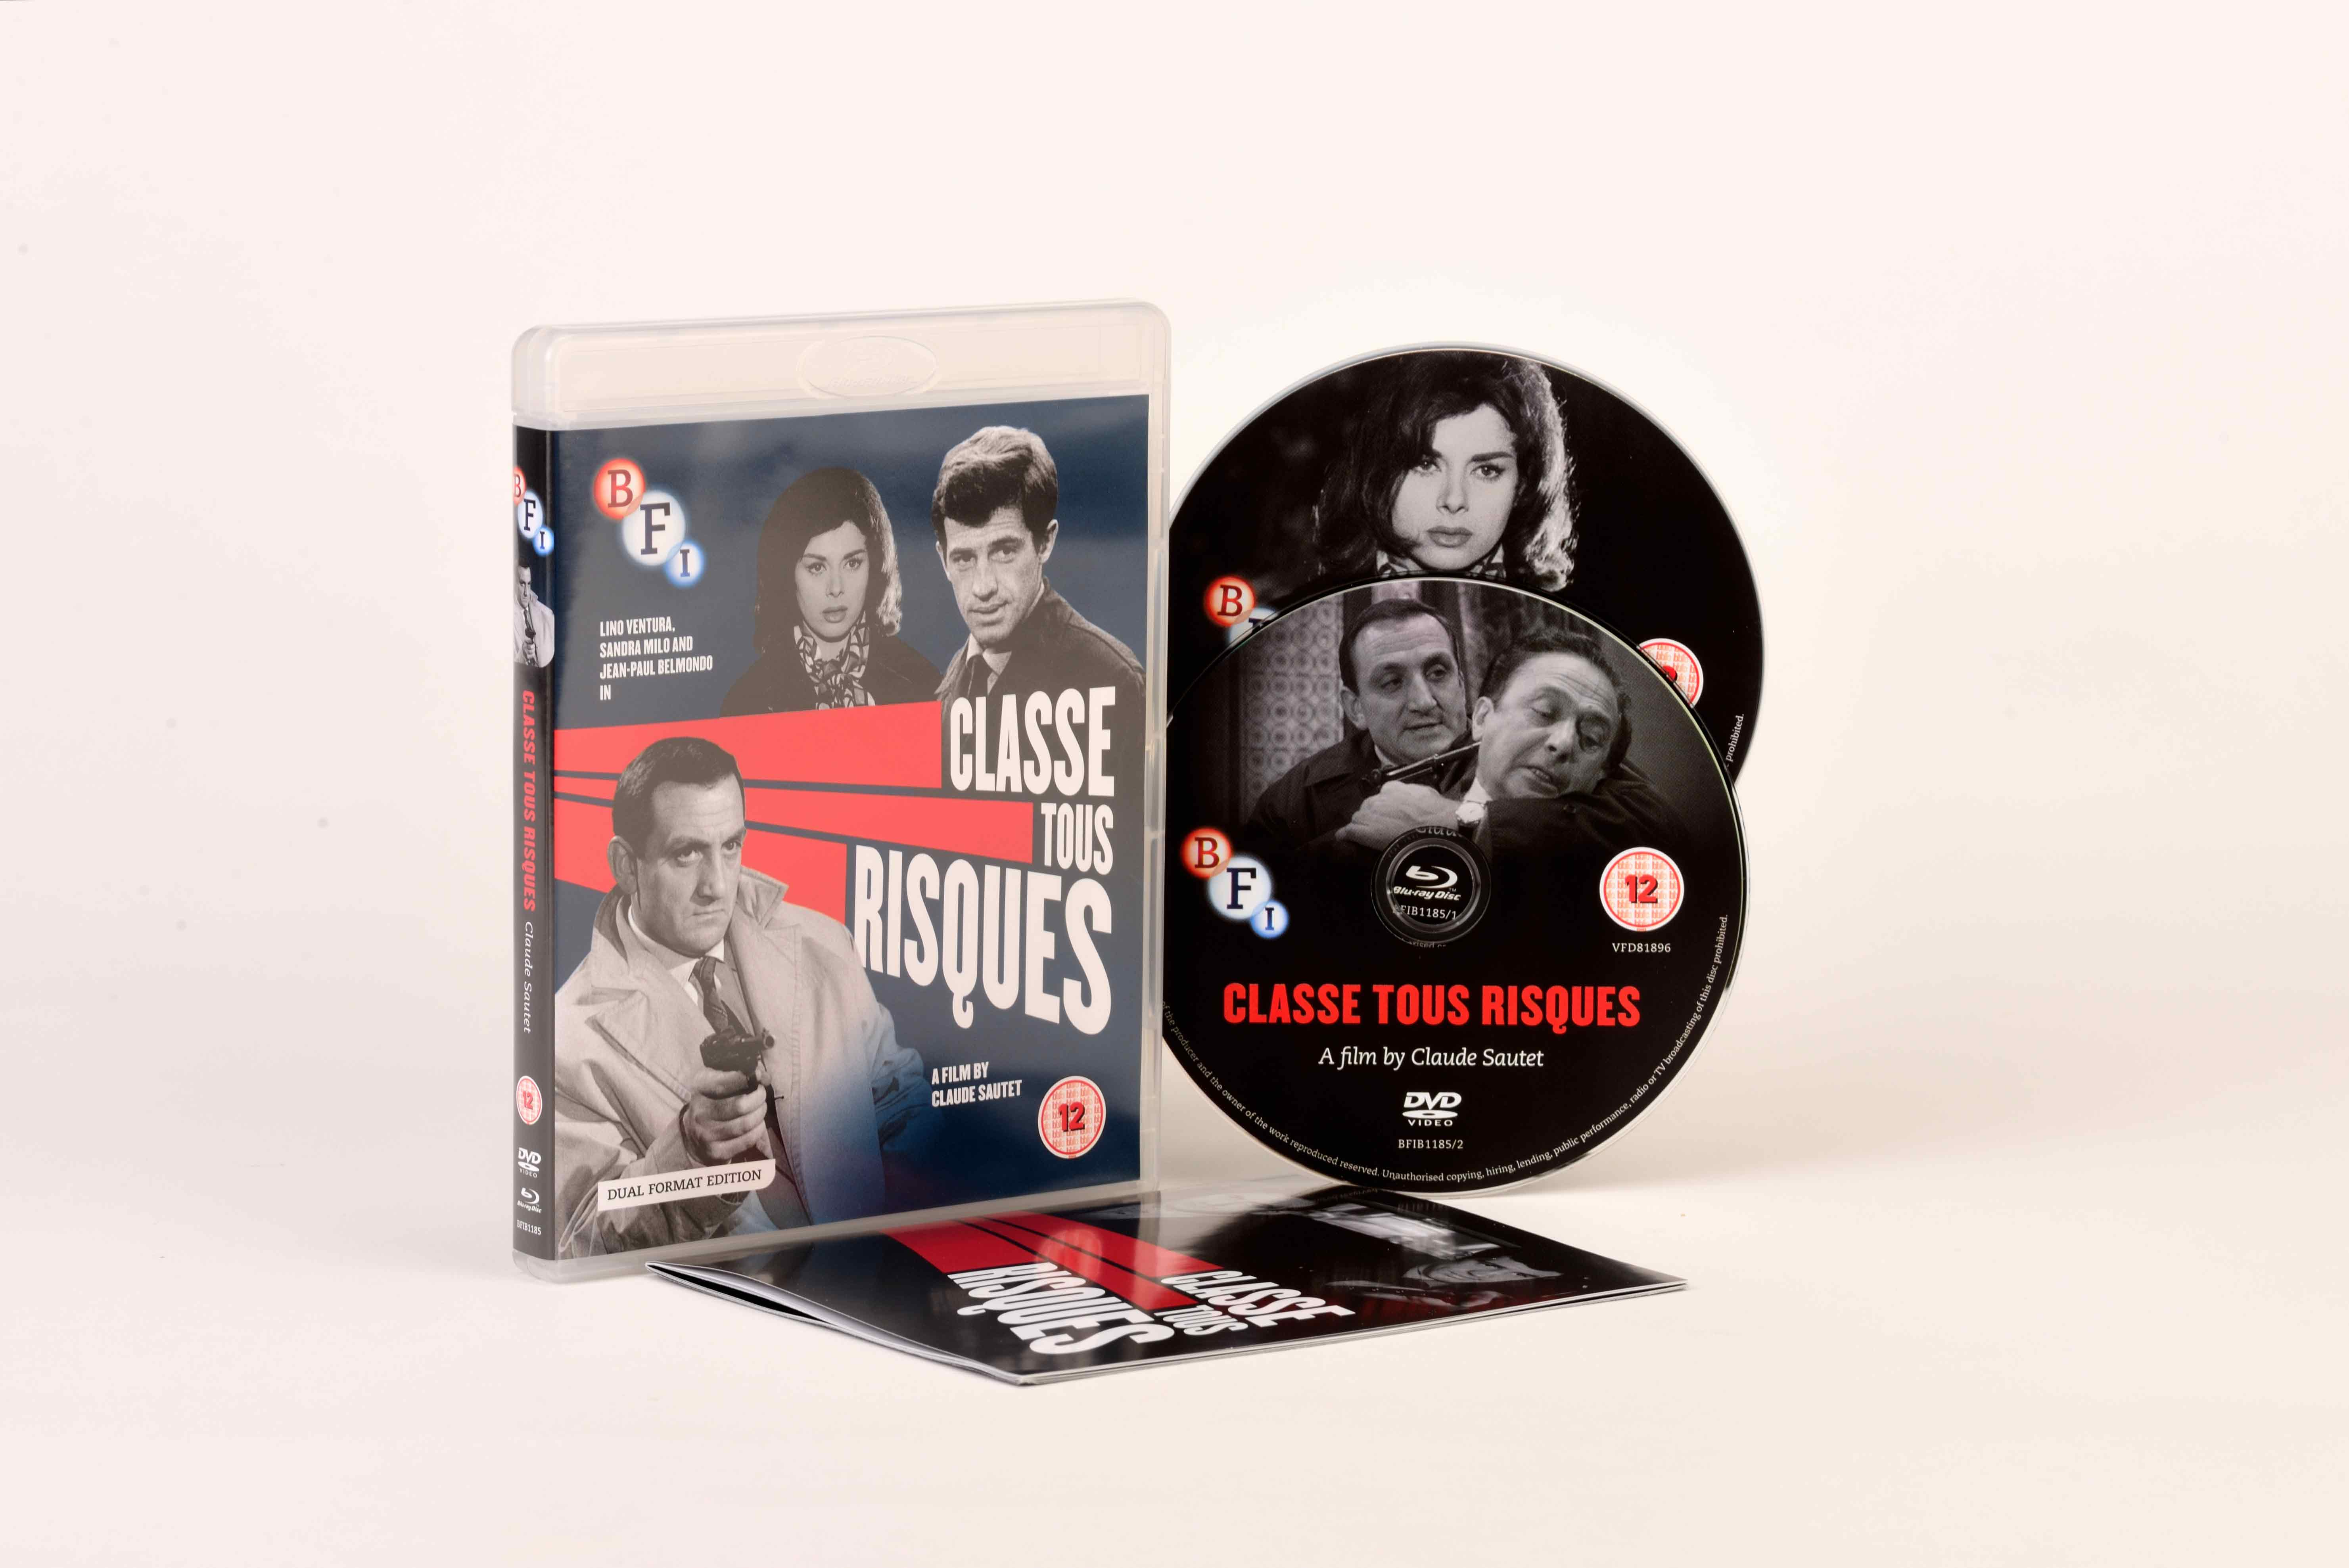 Buy Classe tous risques (Dual Format Edition)